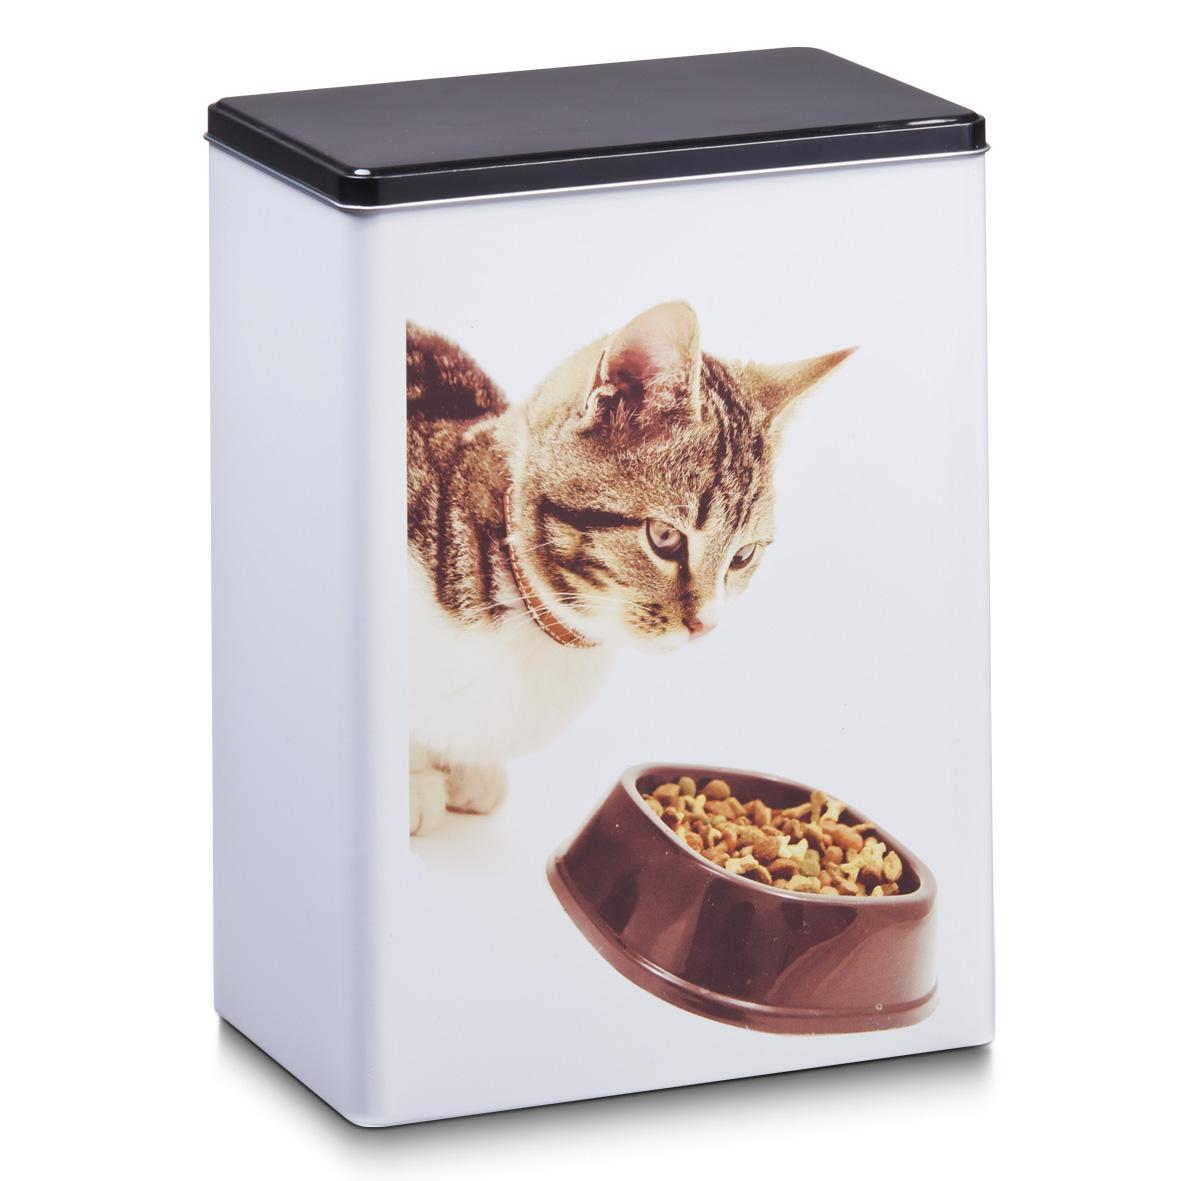 Dóza na kočičí granule, kov